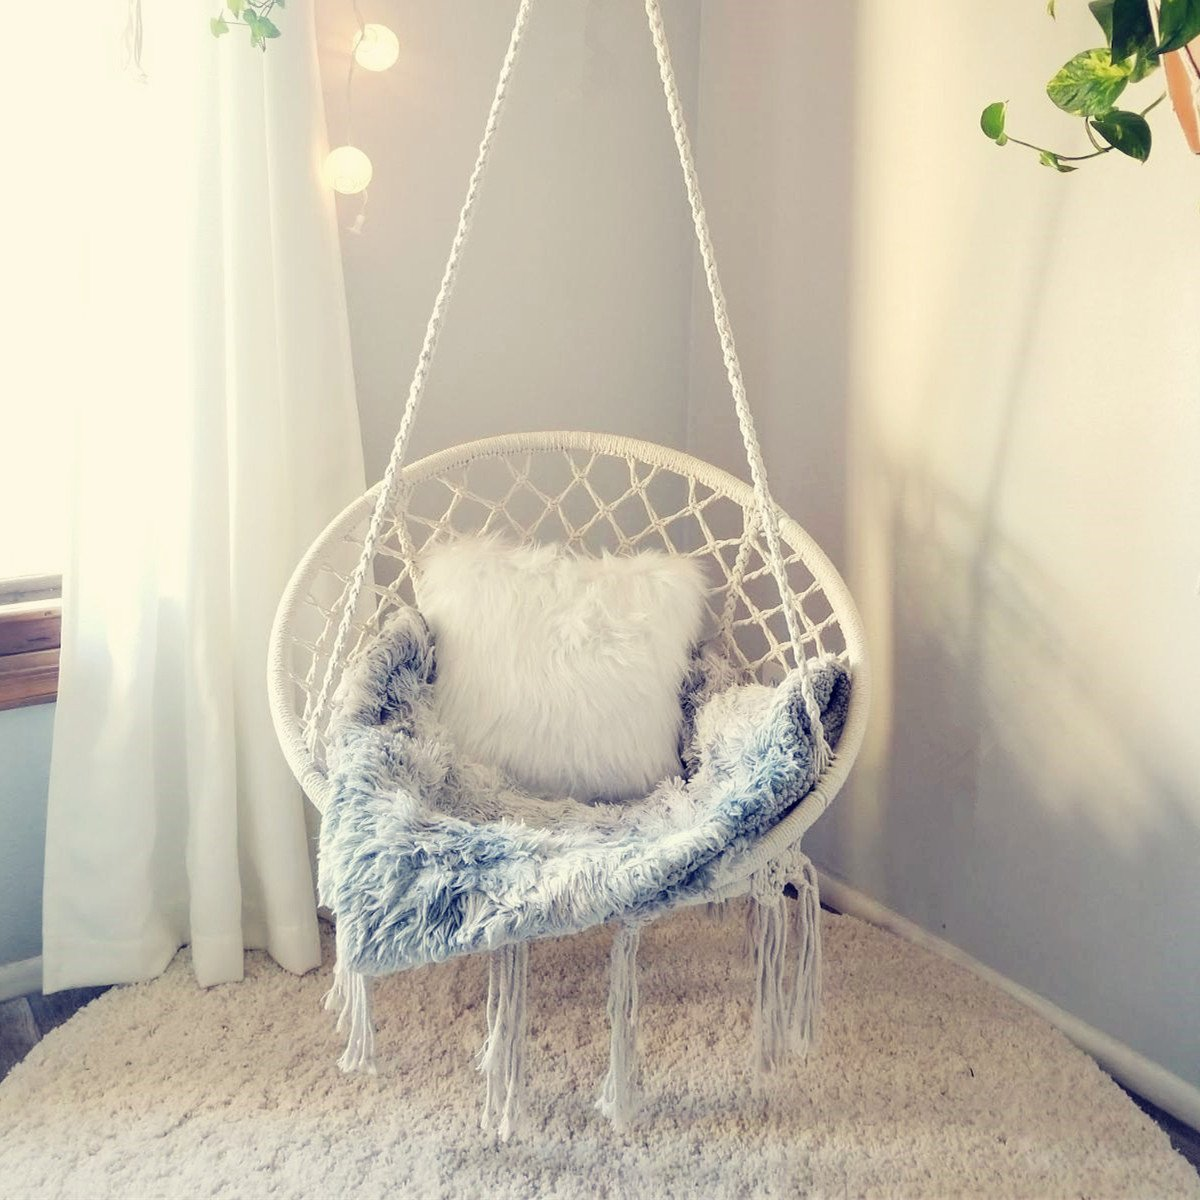 CCTRO Hammock Chair Macrame Swing, Macrame Hammock Chair Swing for Indoor/Outdoor Home Patio Porch Yard Garden Deck, 265 Pound Capacity